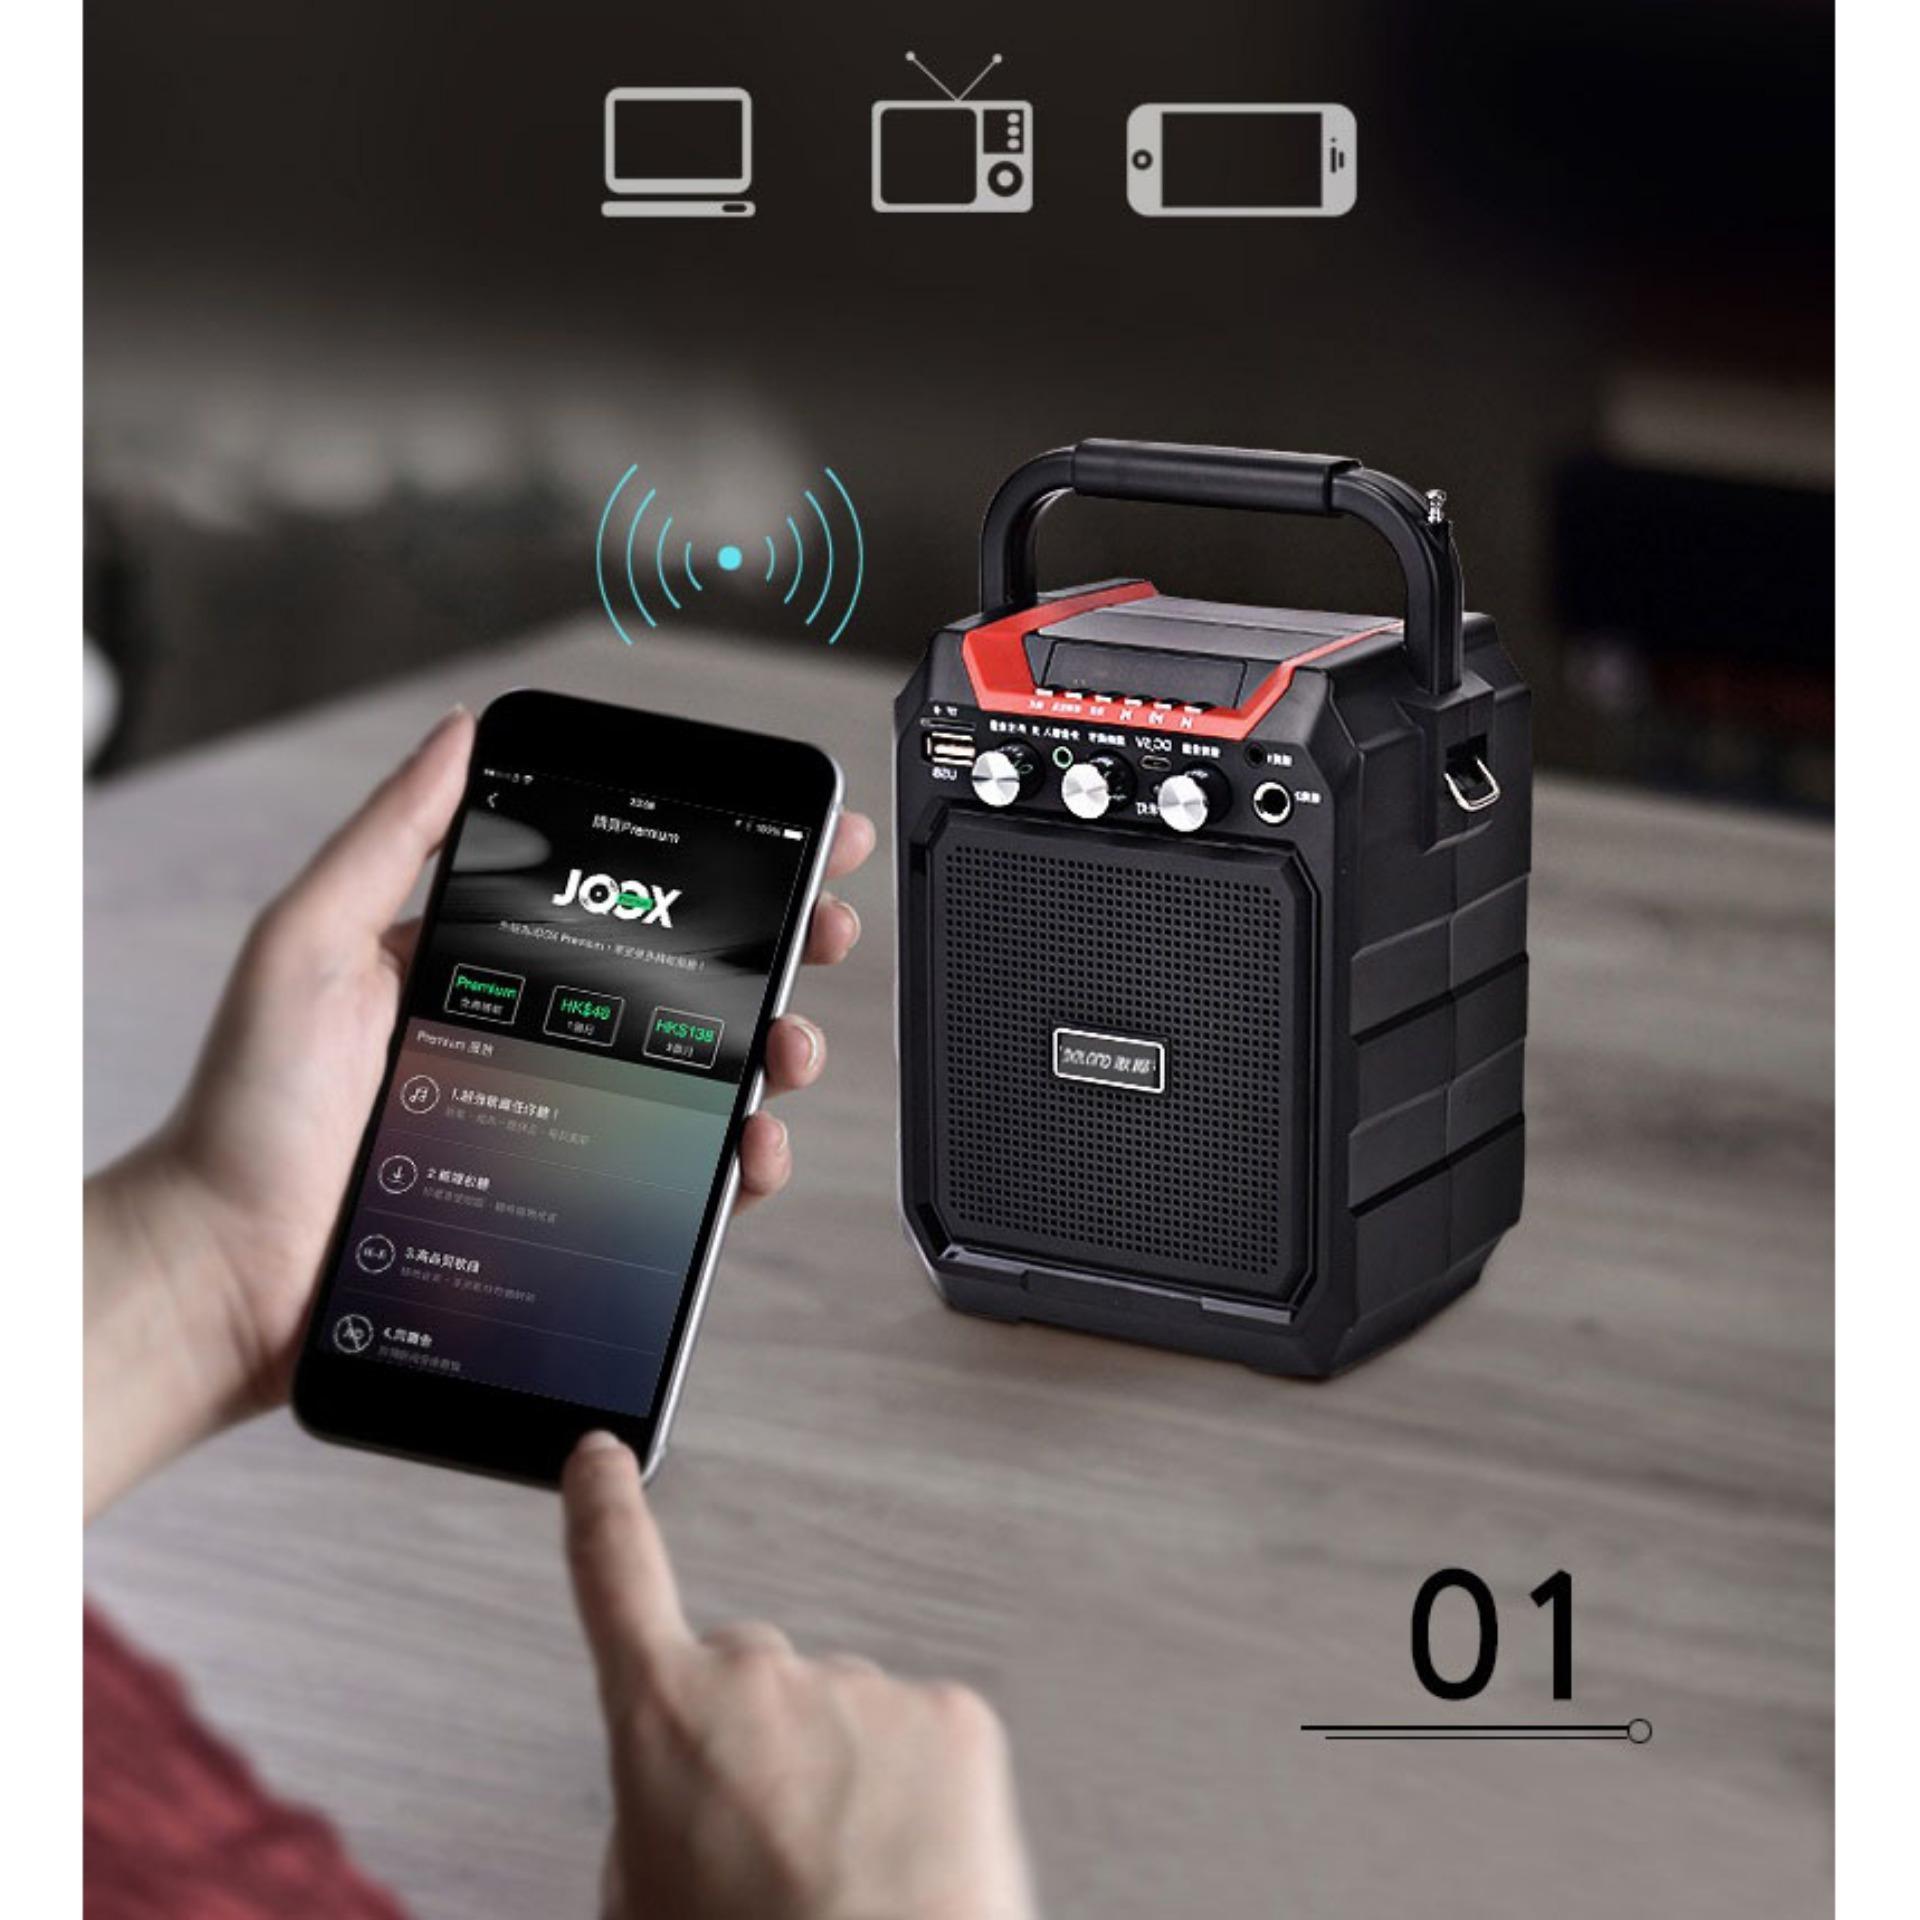 Gia Thung Loa Keo Keo, Loa Bluetooth Dien May Xanh, Loa K99 Hozito Cao Cấp – Top 5 Loa Karaoke Mini Di Động Bán Chạy Nhất Năm 2017 Mẫu 171